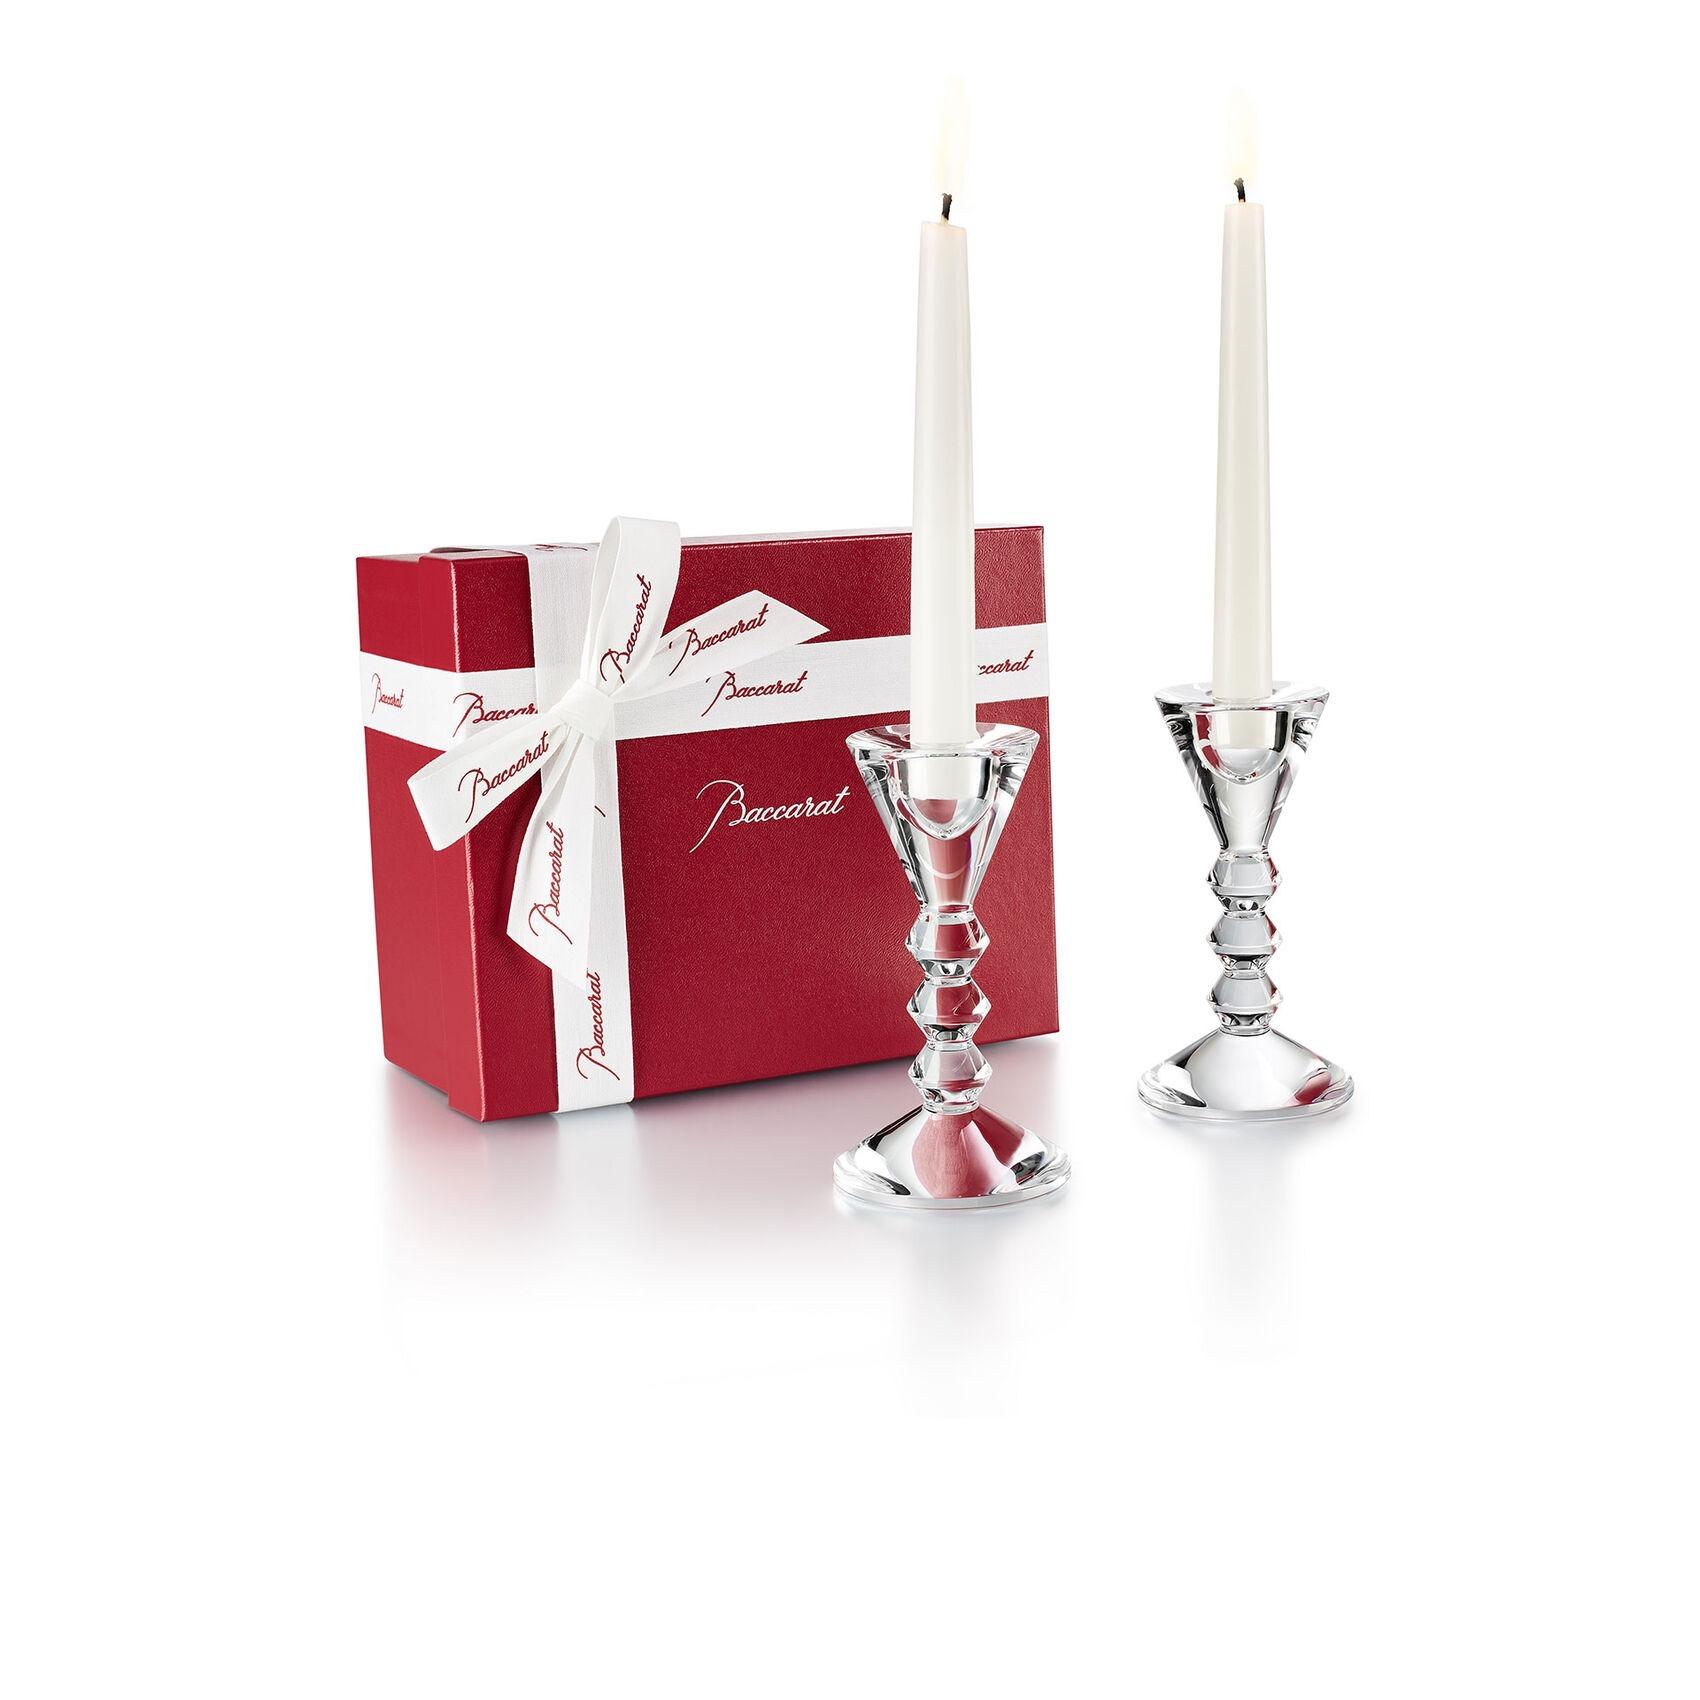 Vega Candlestick